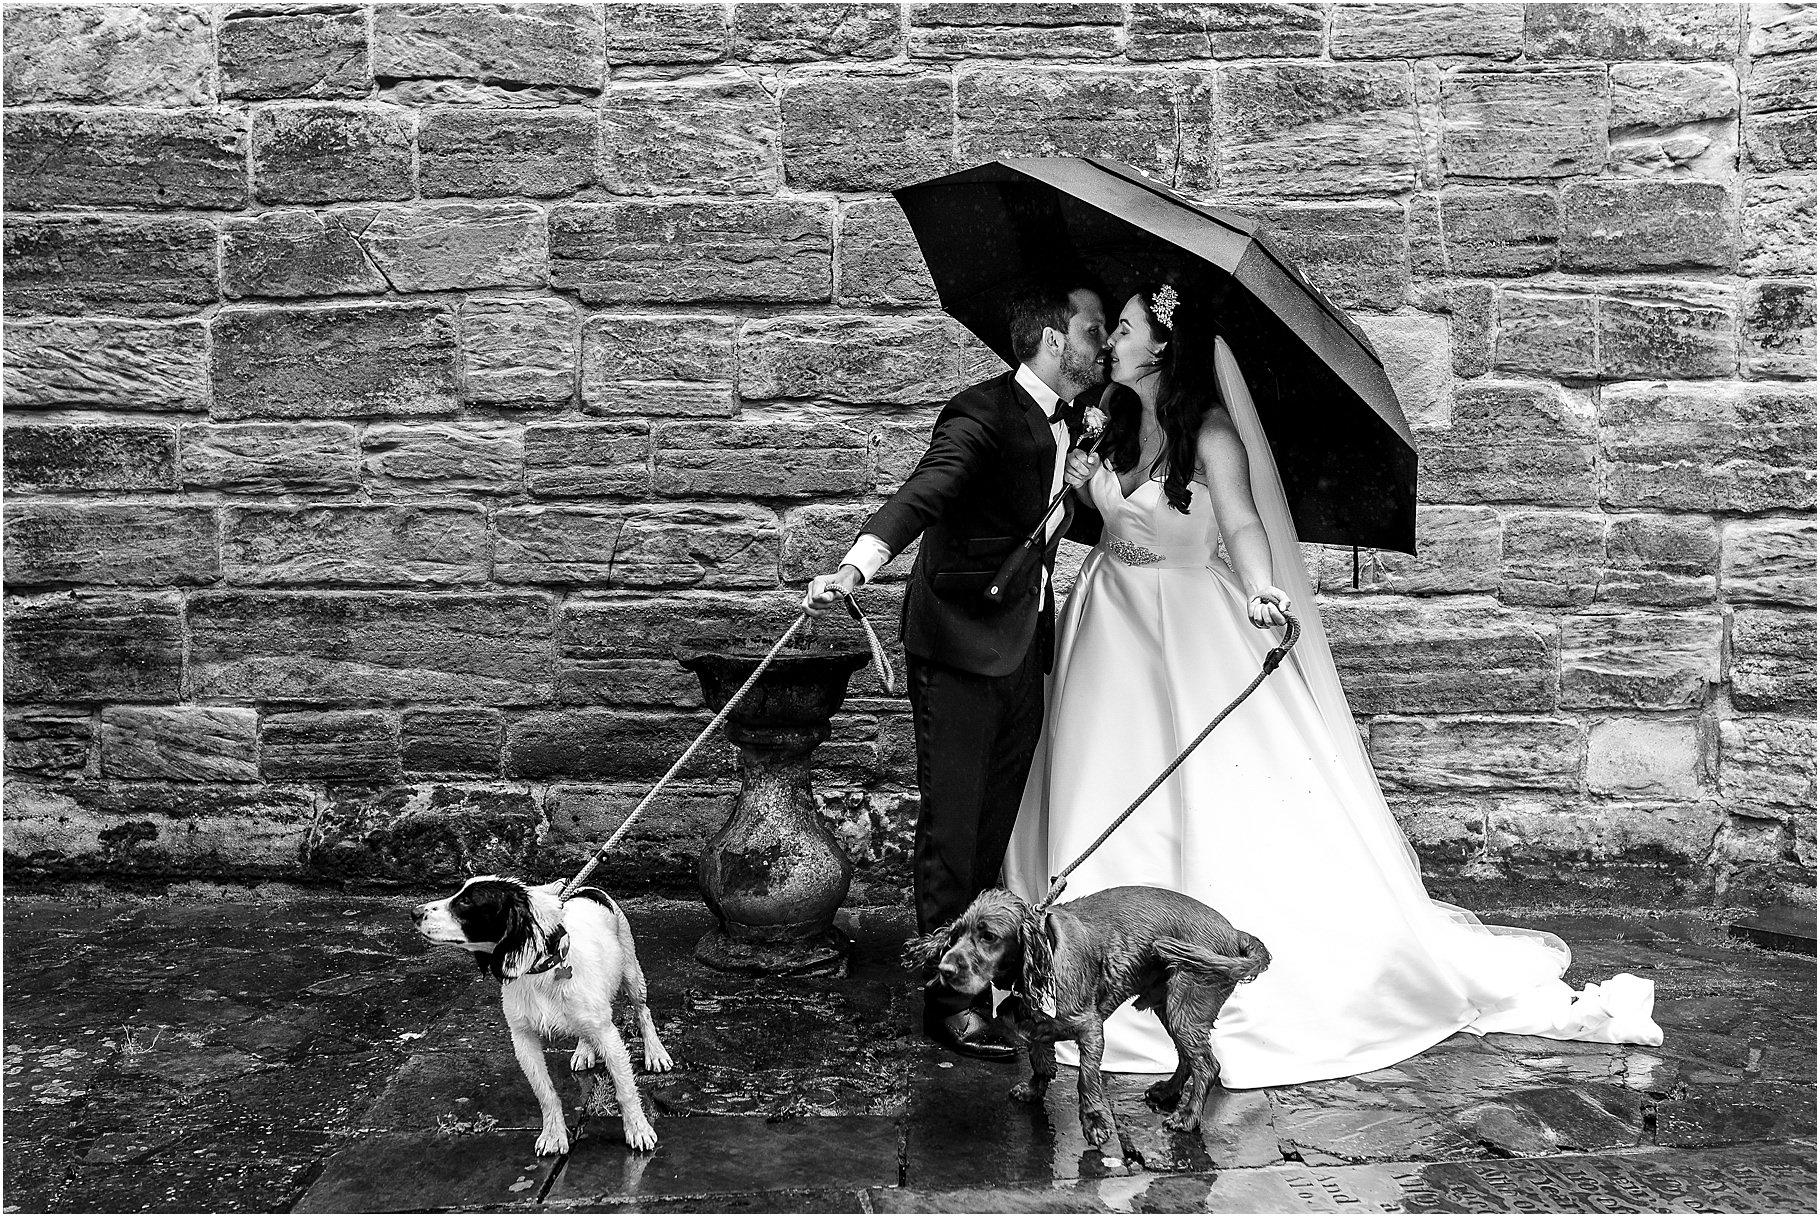 dan-wootton-photography-2017-weddings-165.jpg